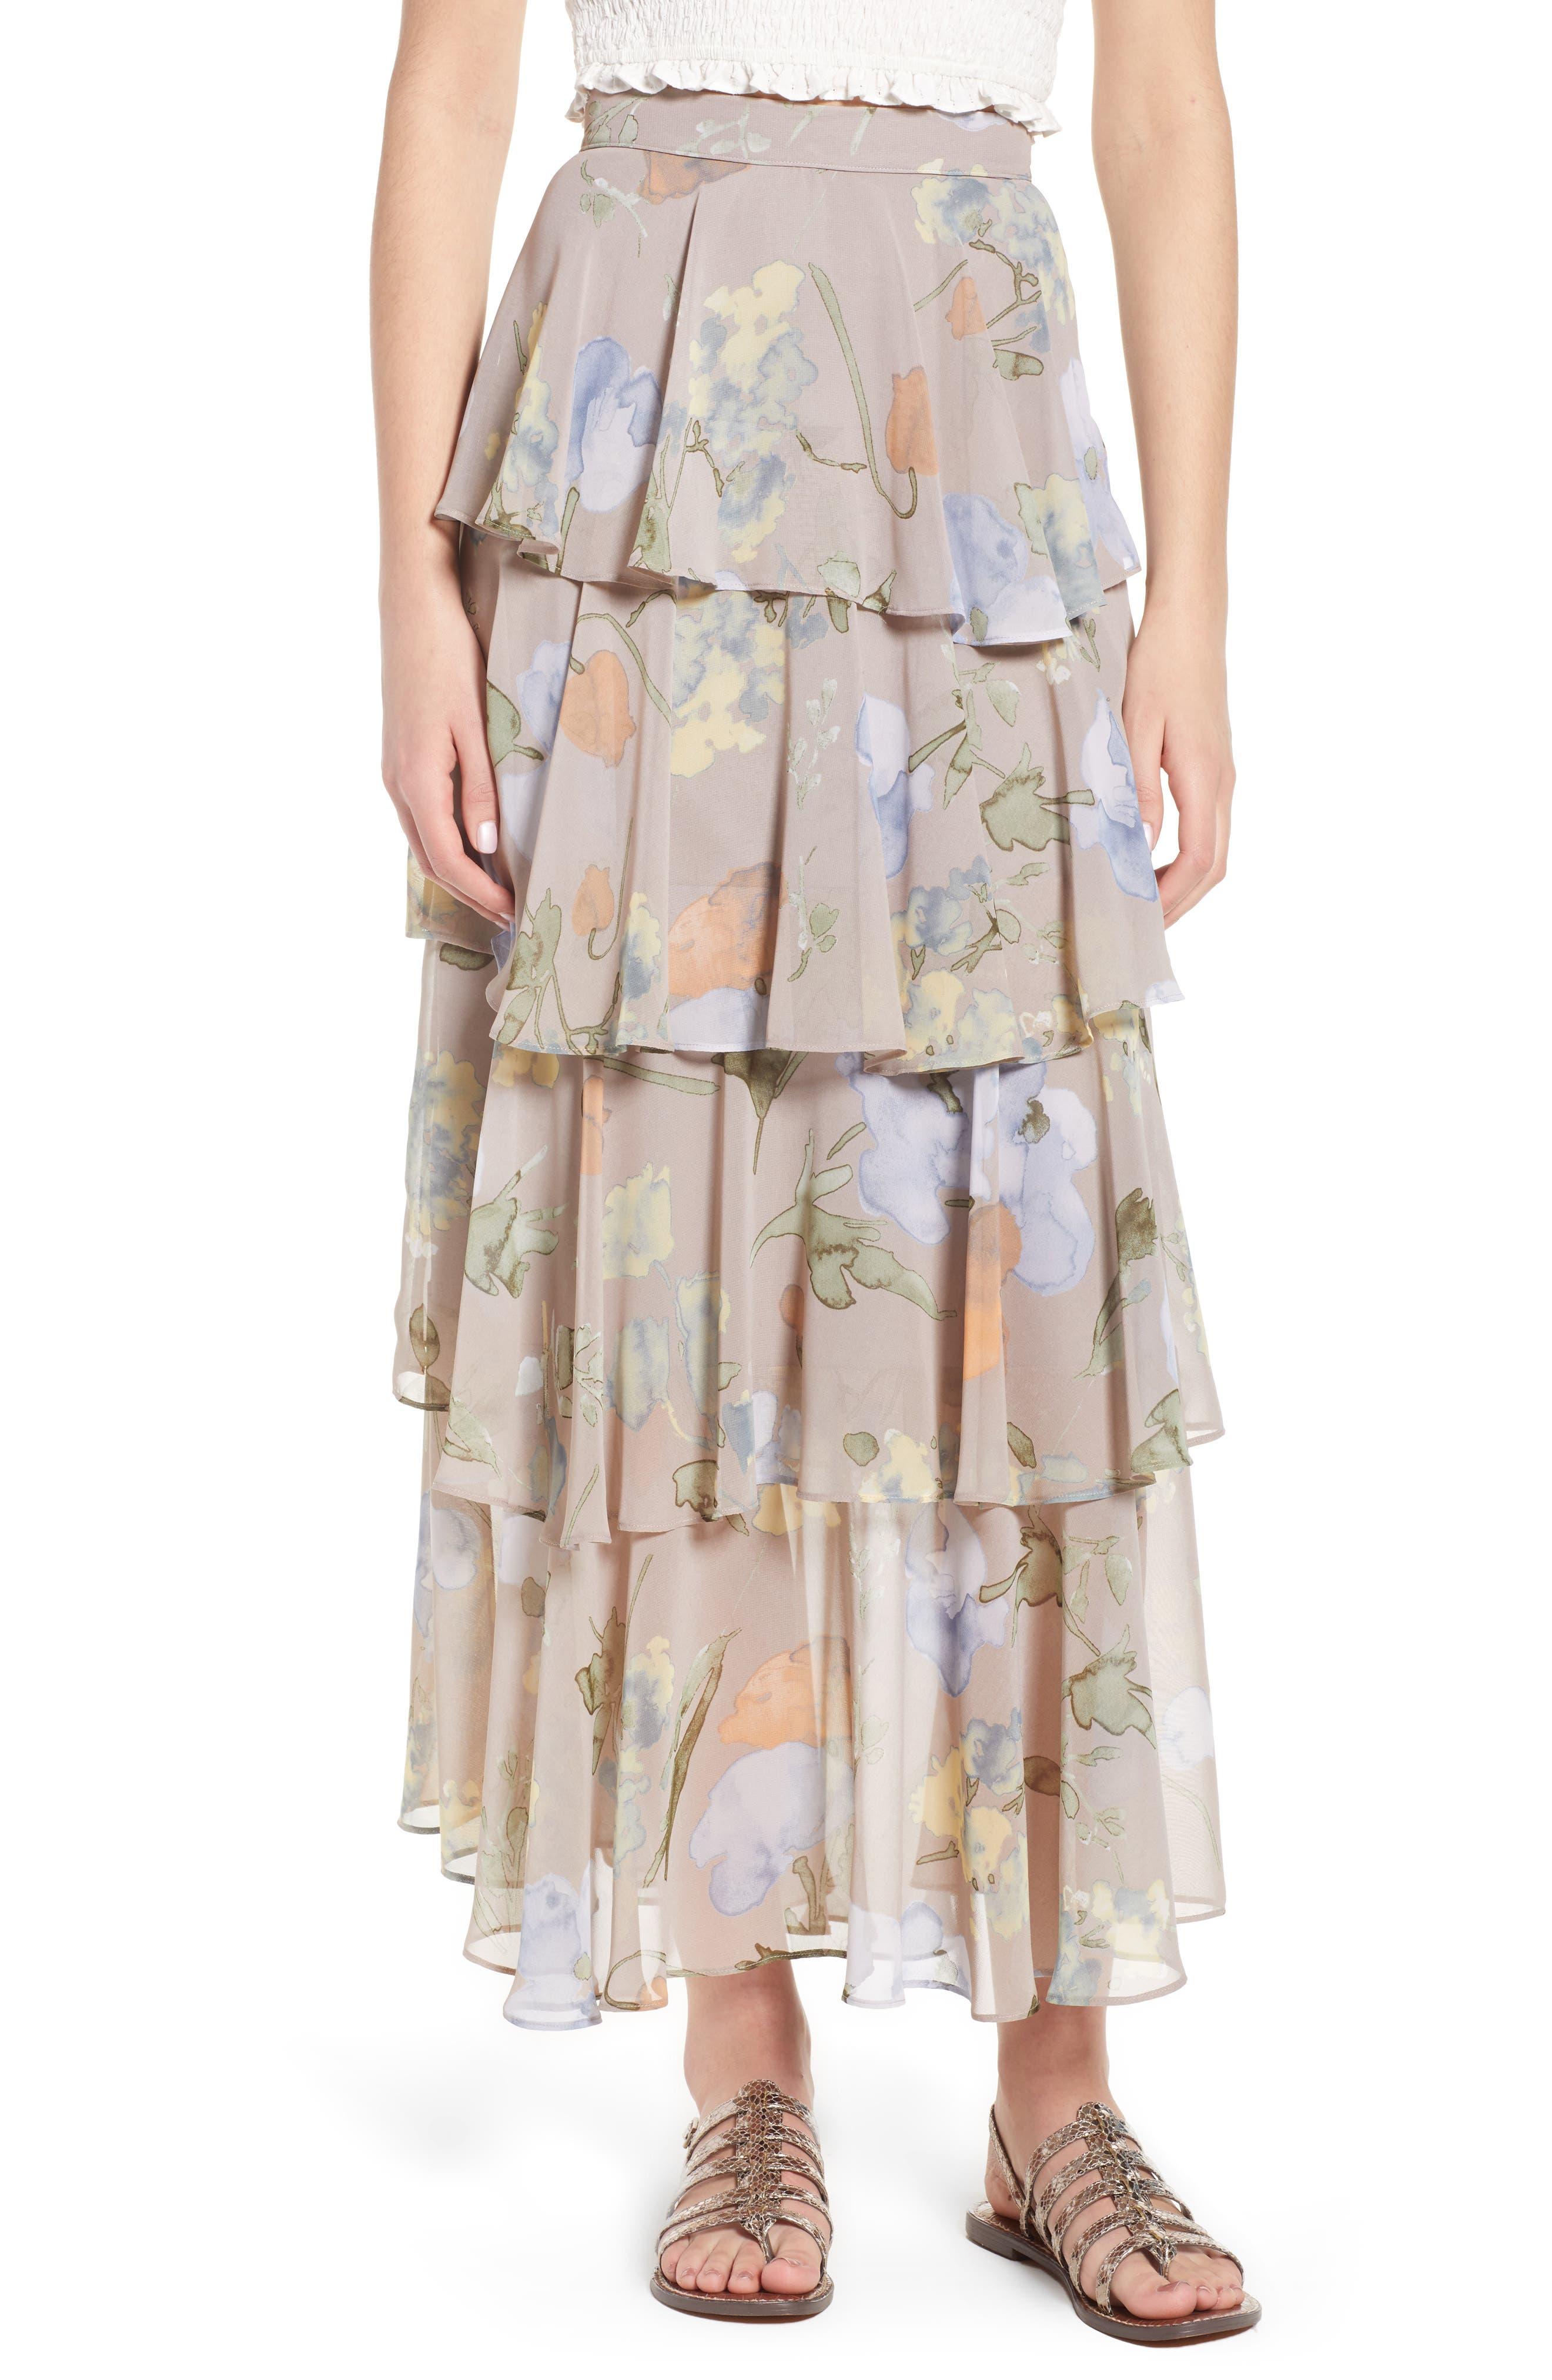 Clarita Floral Tiered Maxi Skirt,                             Main thumbnail 1, color,                             020